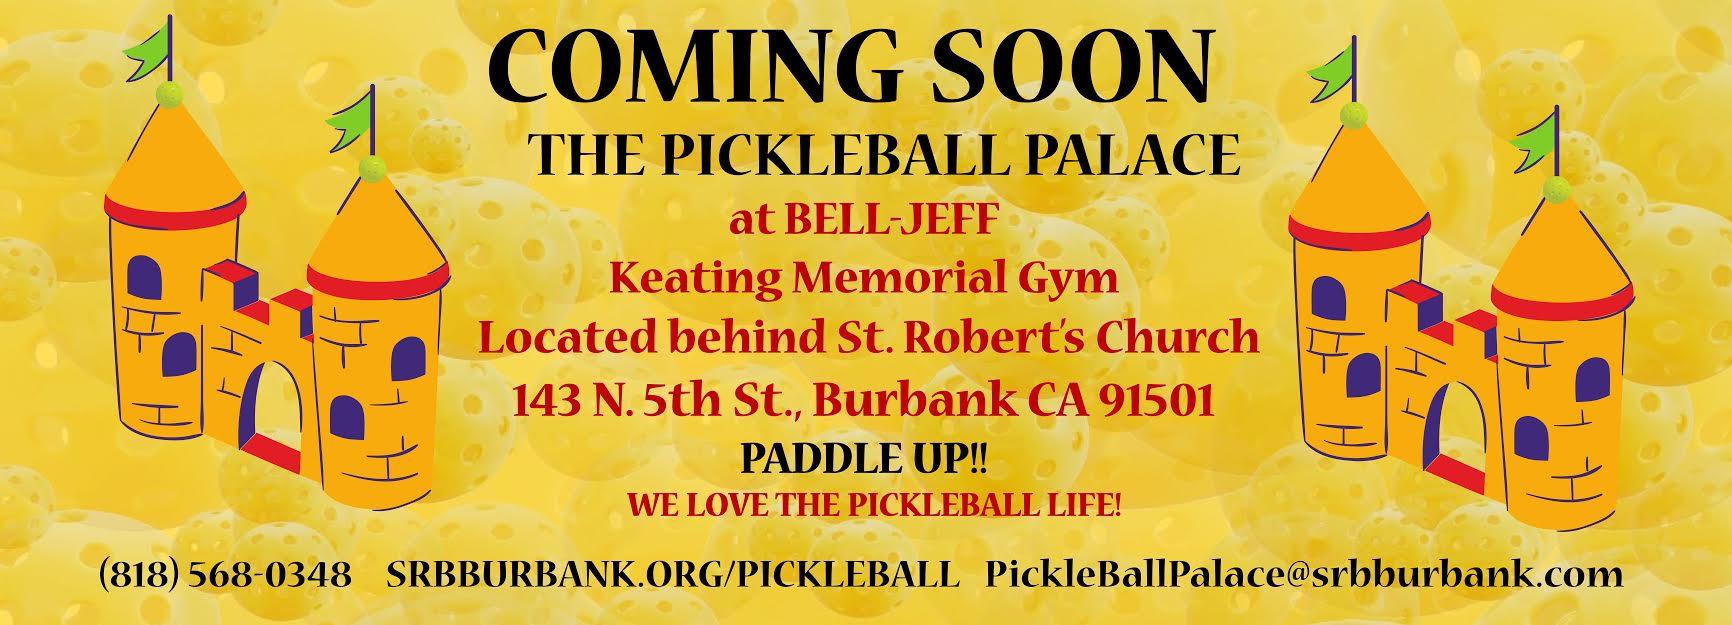 Pickleball Scheduling